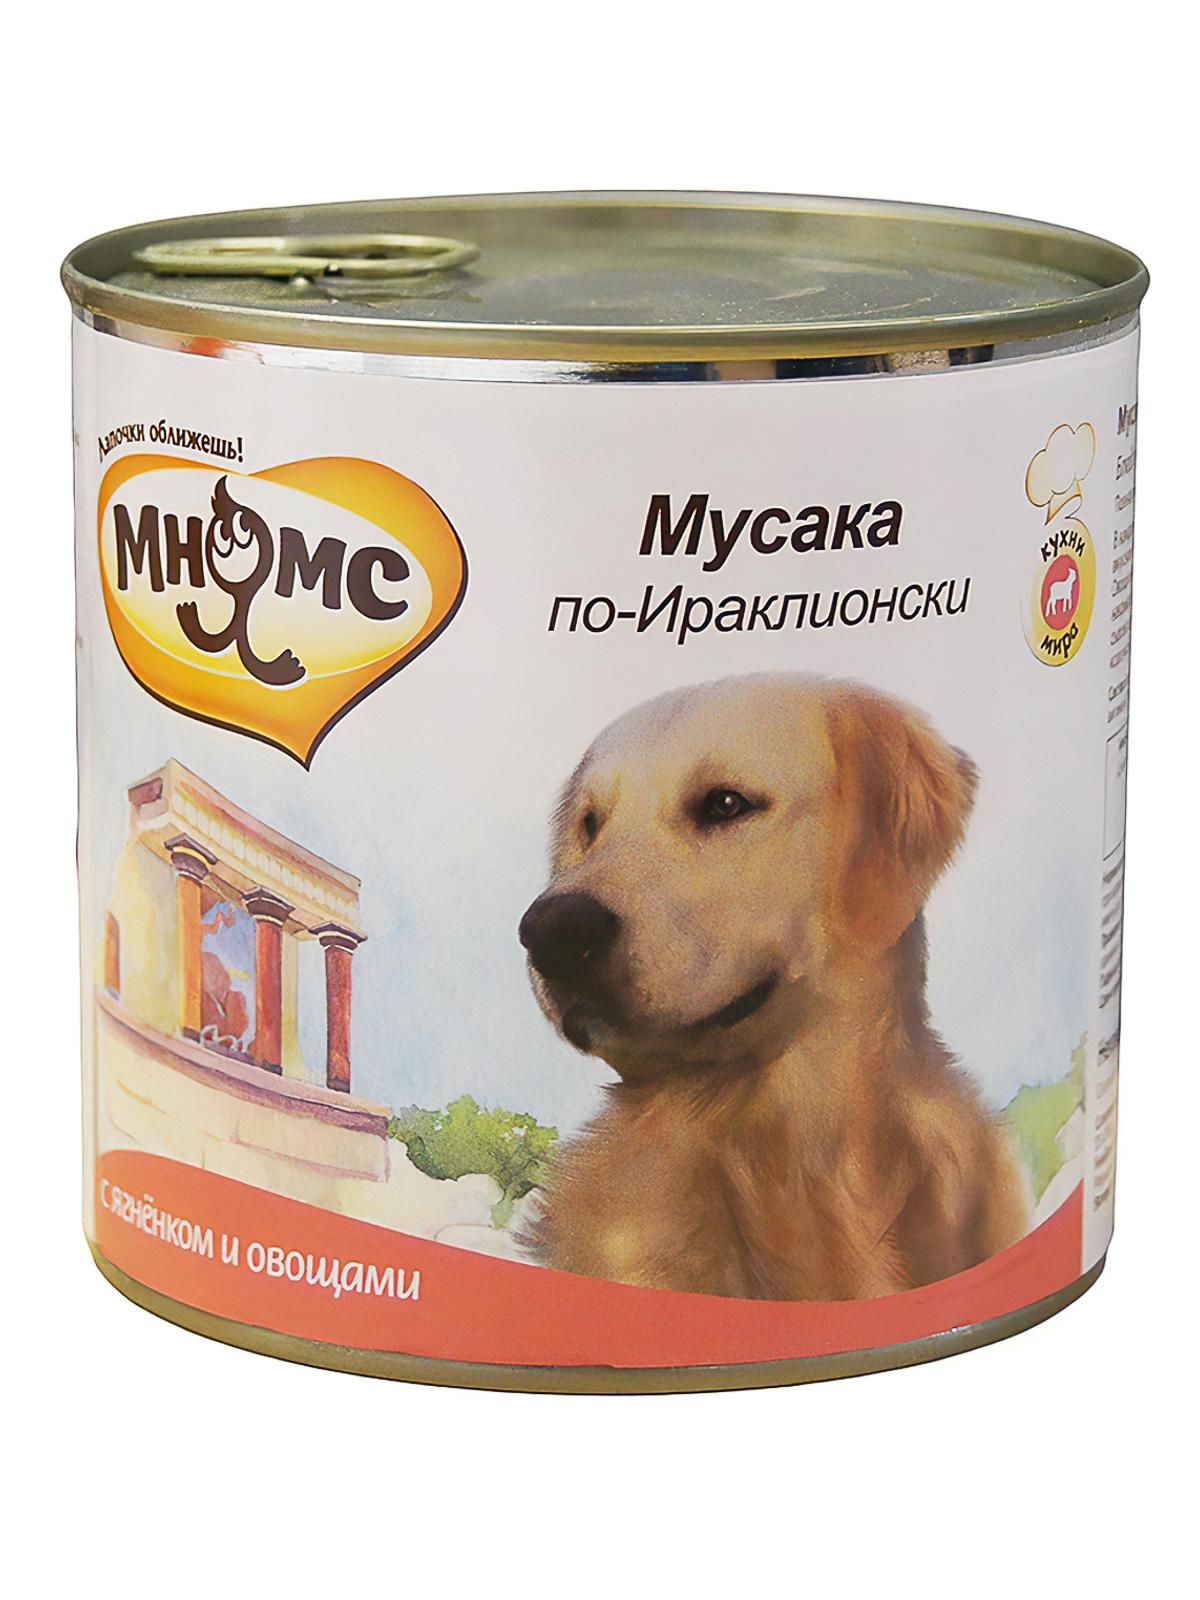 Мнямс Консервы для собак Мнямс Мусака по-Ираклионски (ягненок с овощами) 57621_1.jpg